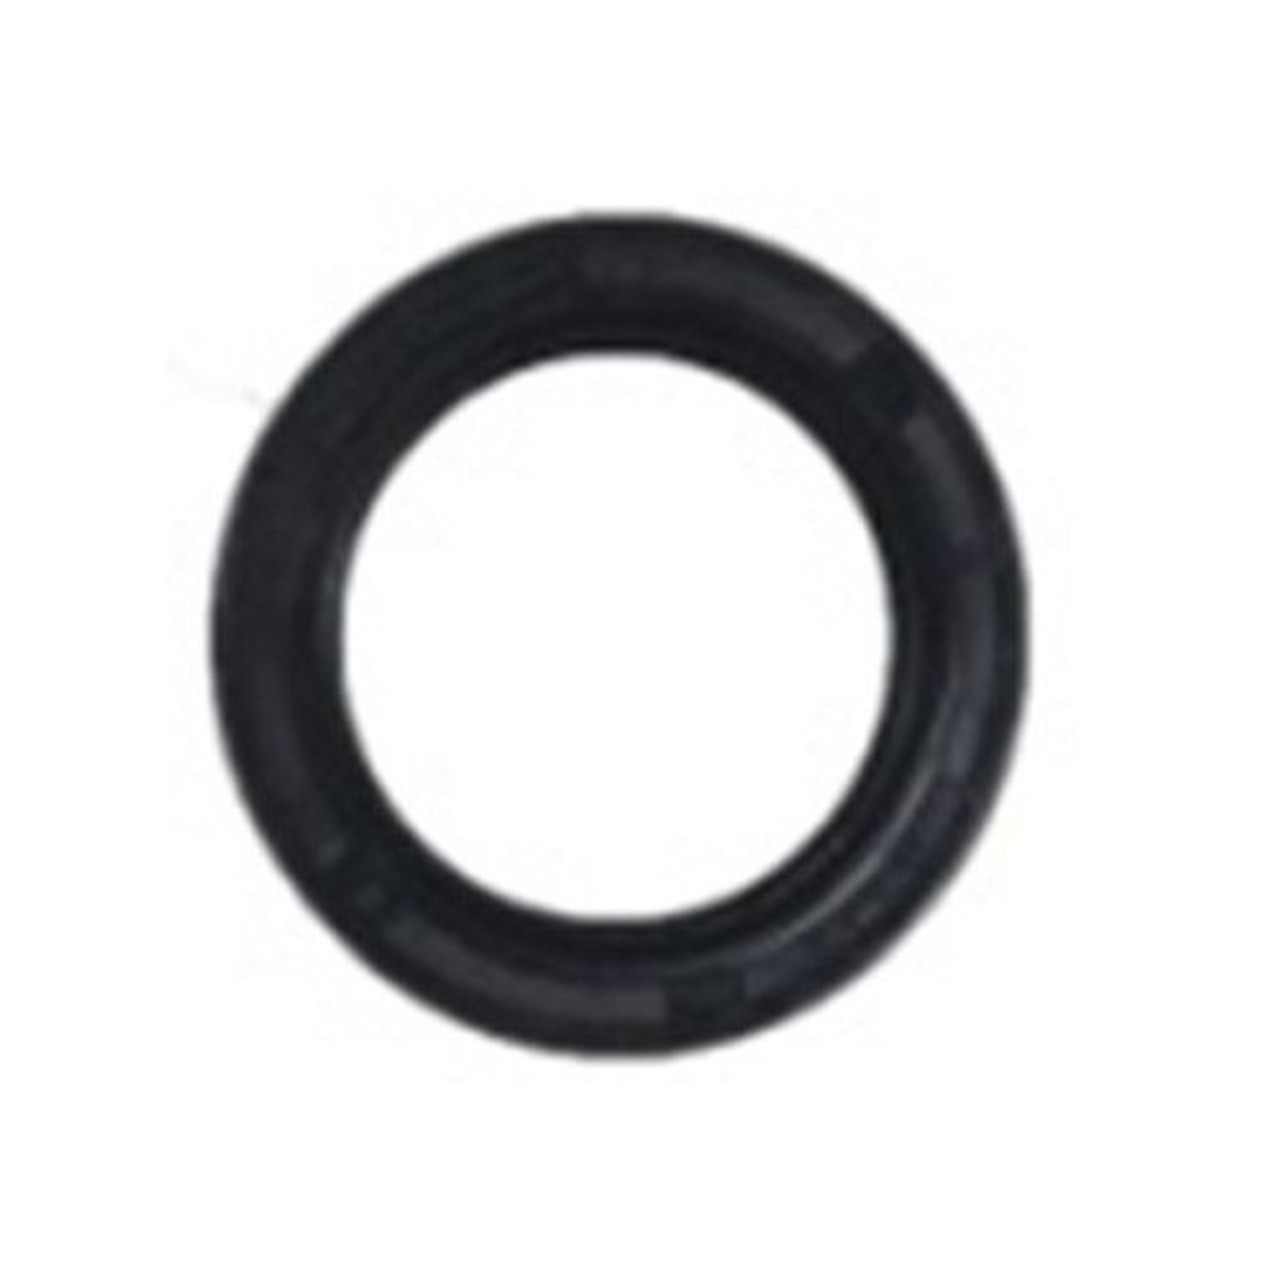 Oil Seal; 30x42x4.5 for ATA 110 B/B1 111644